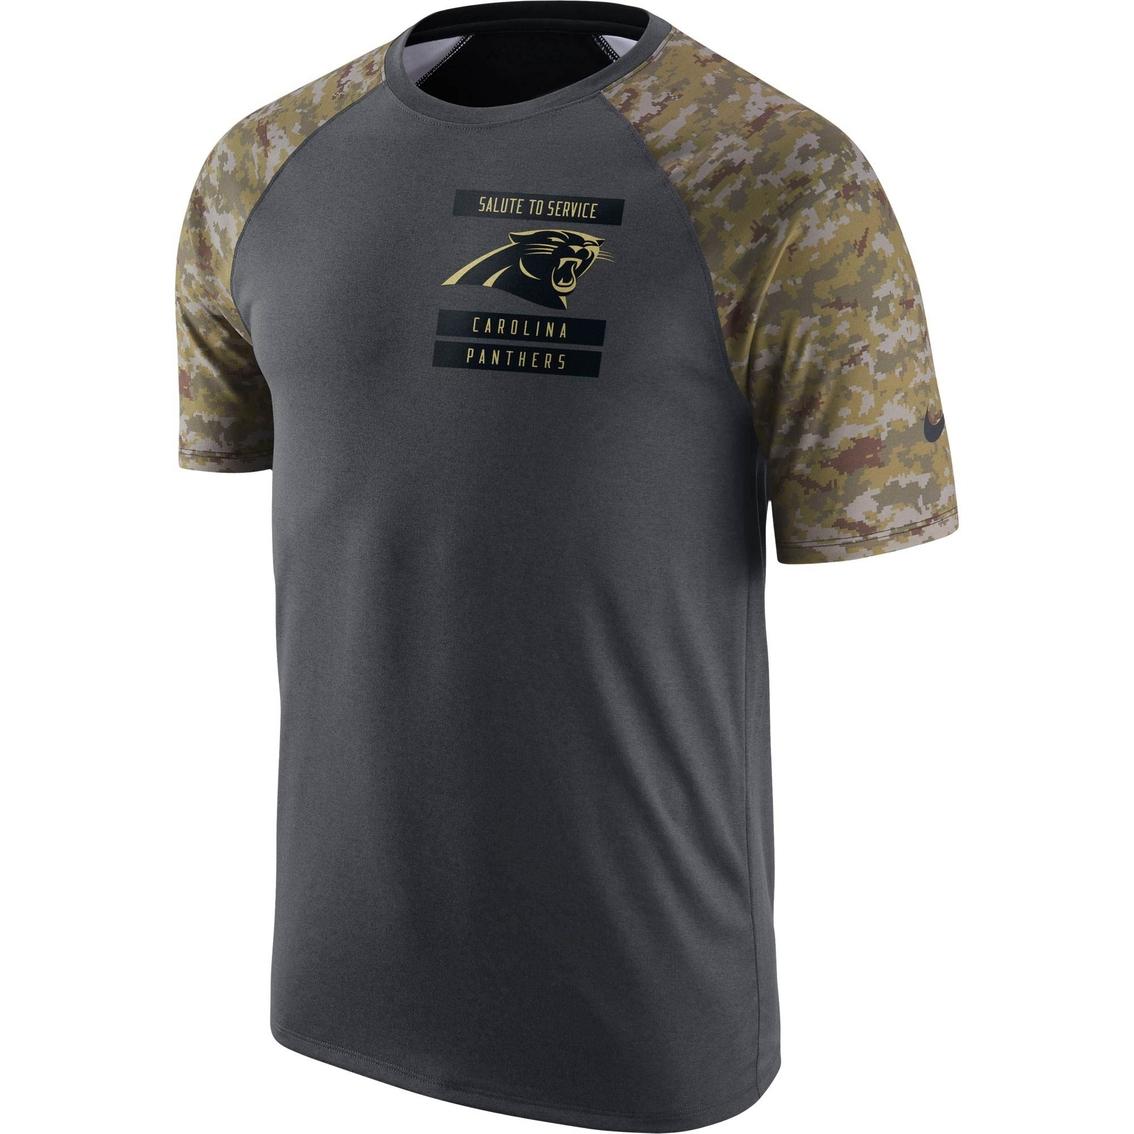 reputable site 213db a1c7d Nike Nfl Carolina Panthers Men's Salute To Service Tee ...